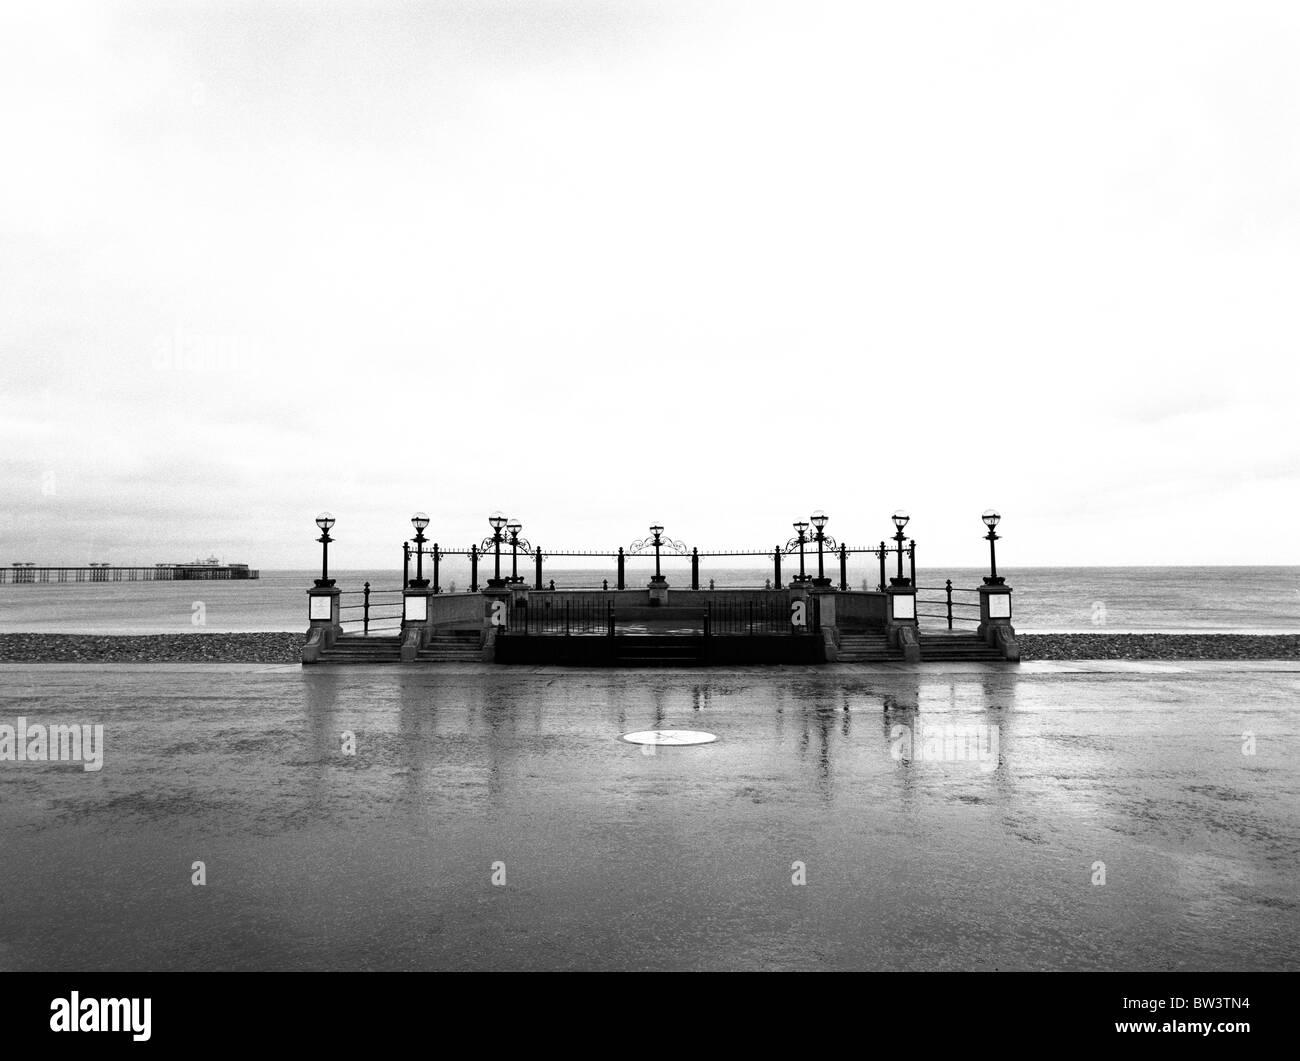 Llandudno bandstand with rain in b&w - Stock Image